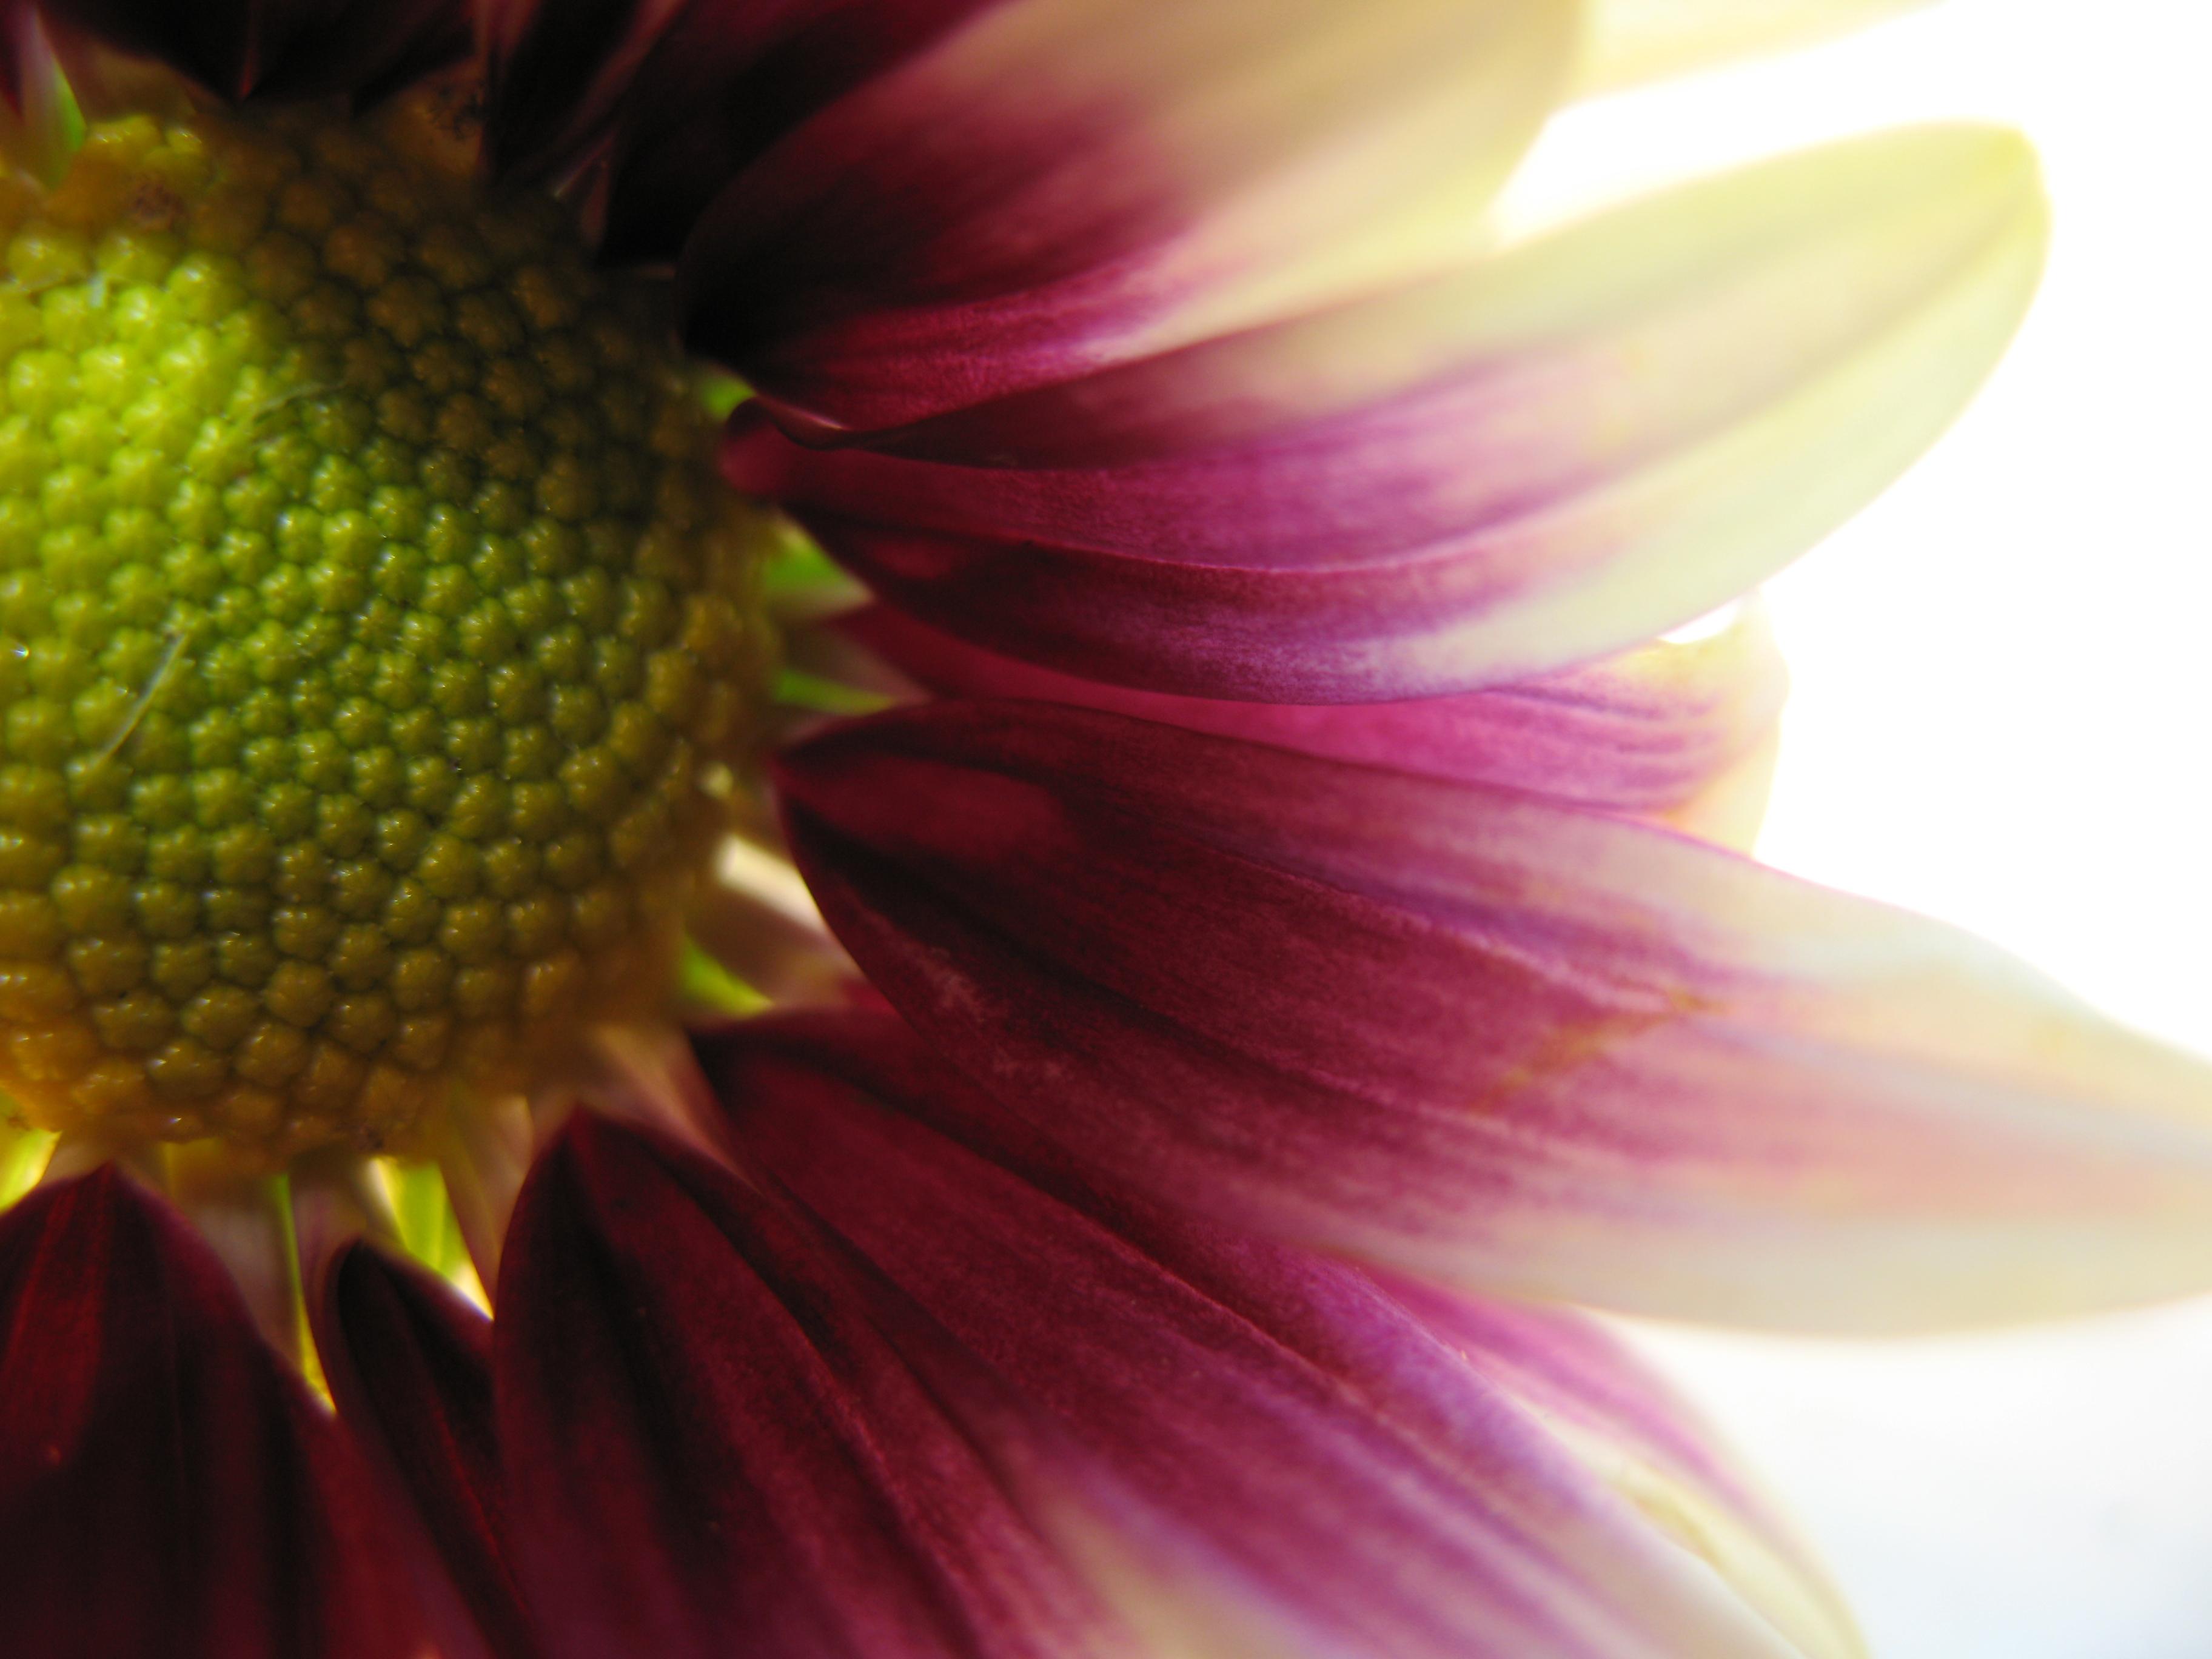 Nature simplistic beauty, Closeup, Flower, Life, Nature, HQ Photo